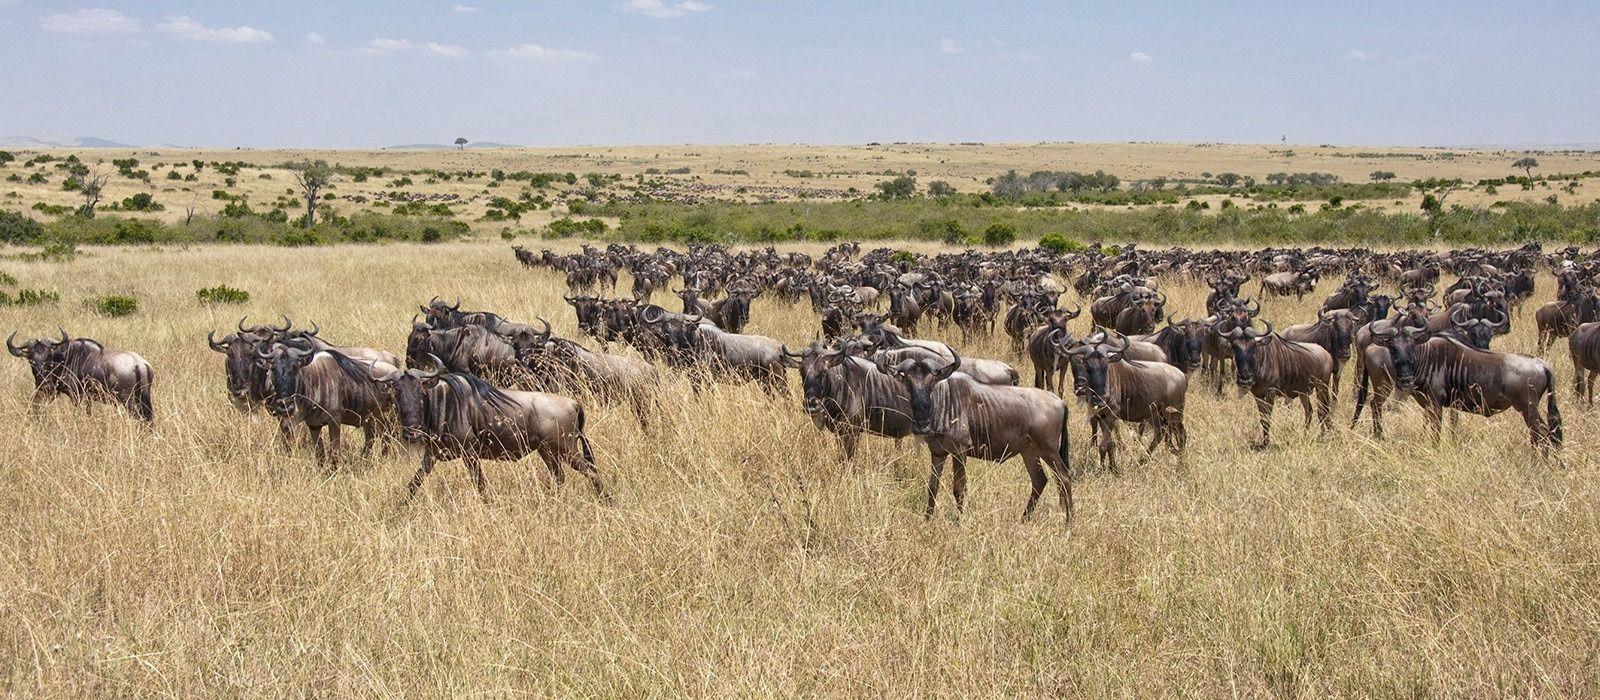 Kenia: Masai Mara, Wandersafaris & Traumstrände Urlaub 6